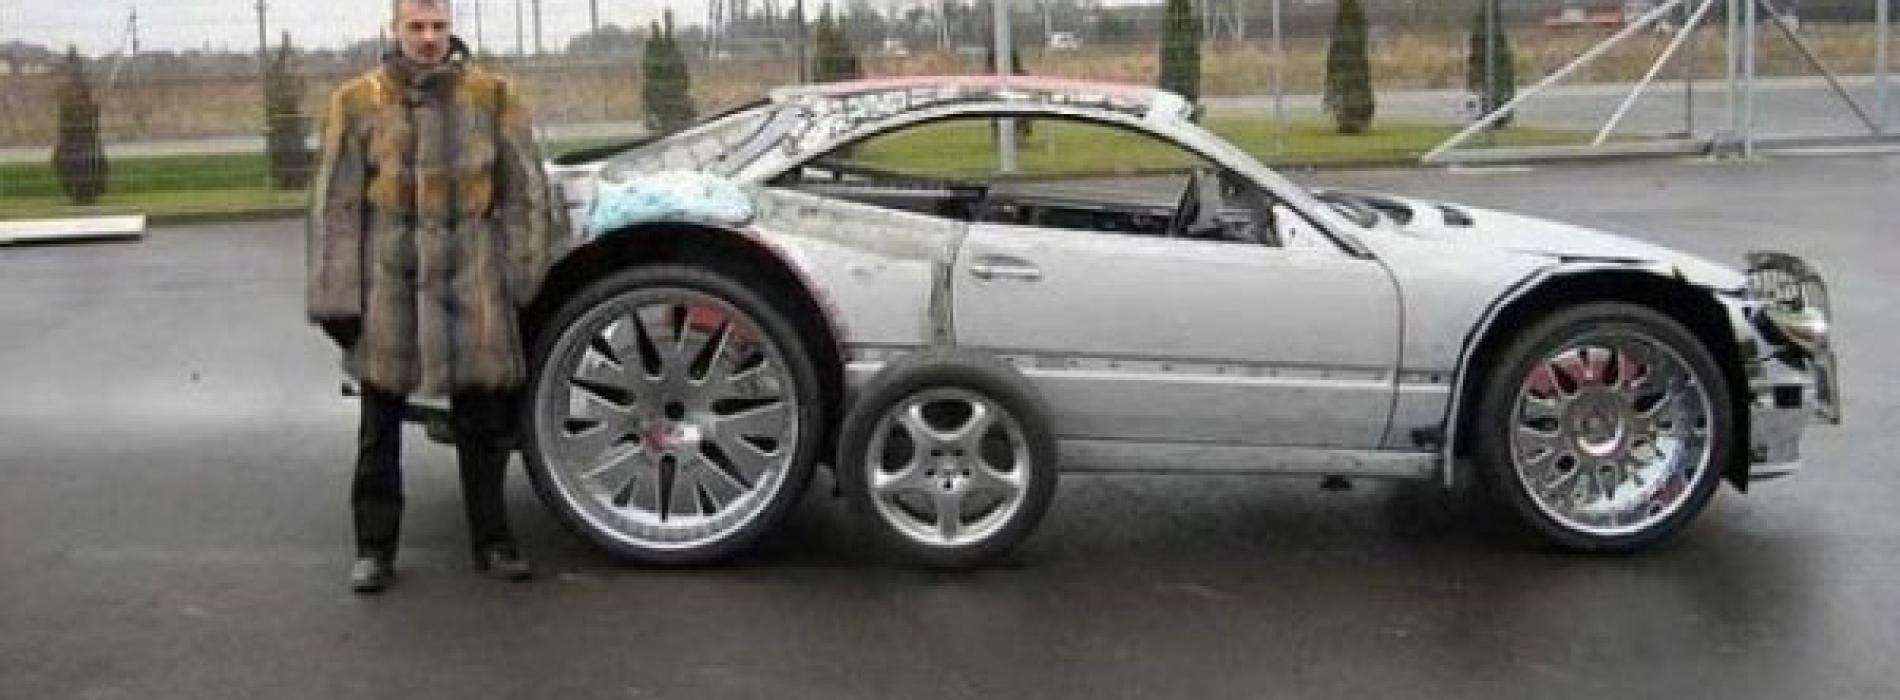 Тунинговани коли!? Или не точно…